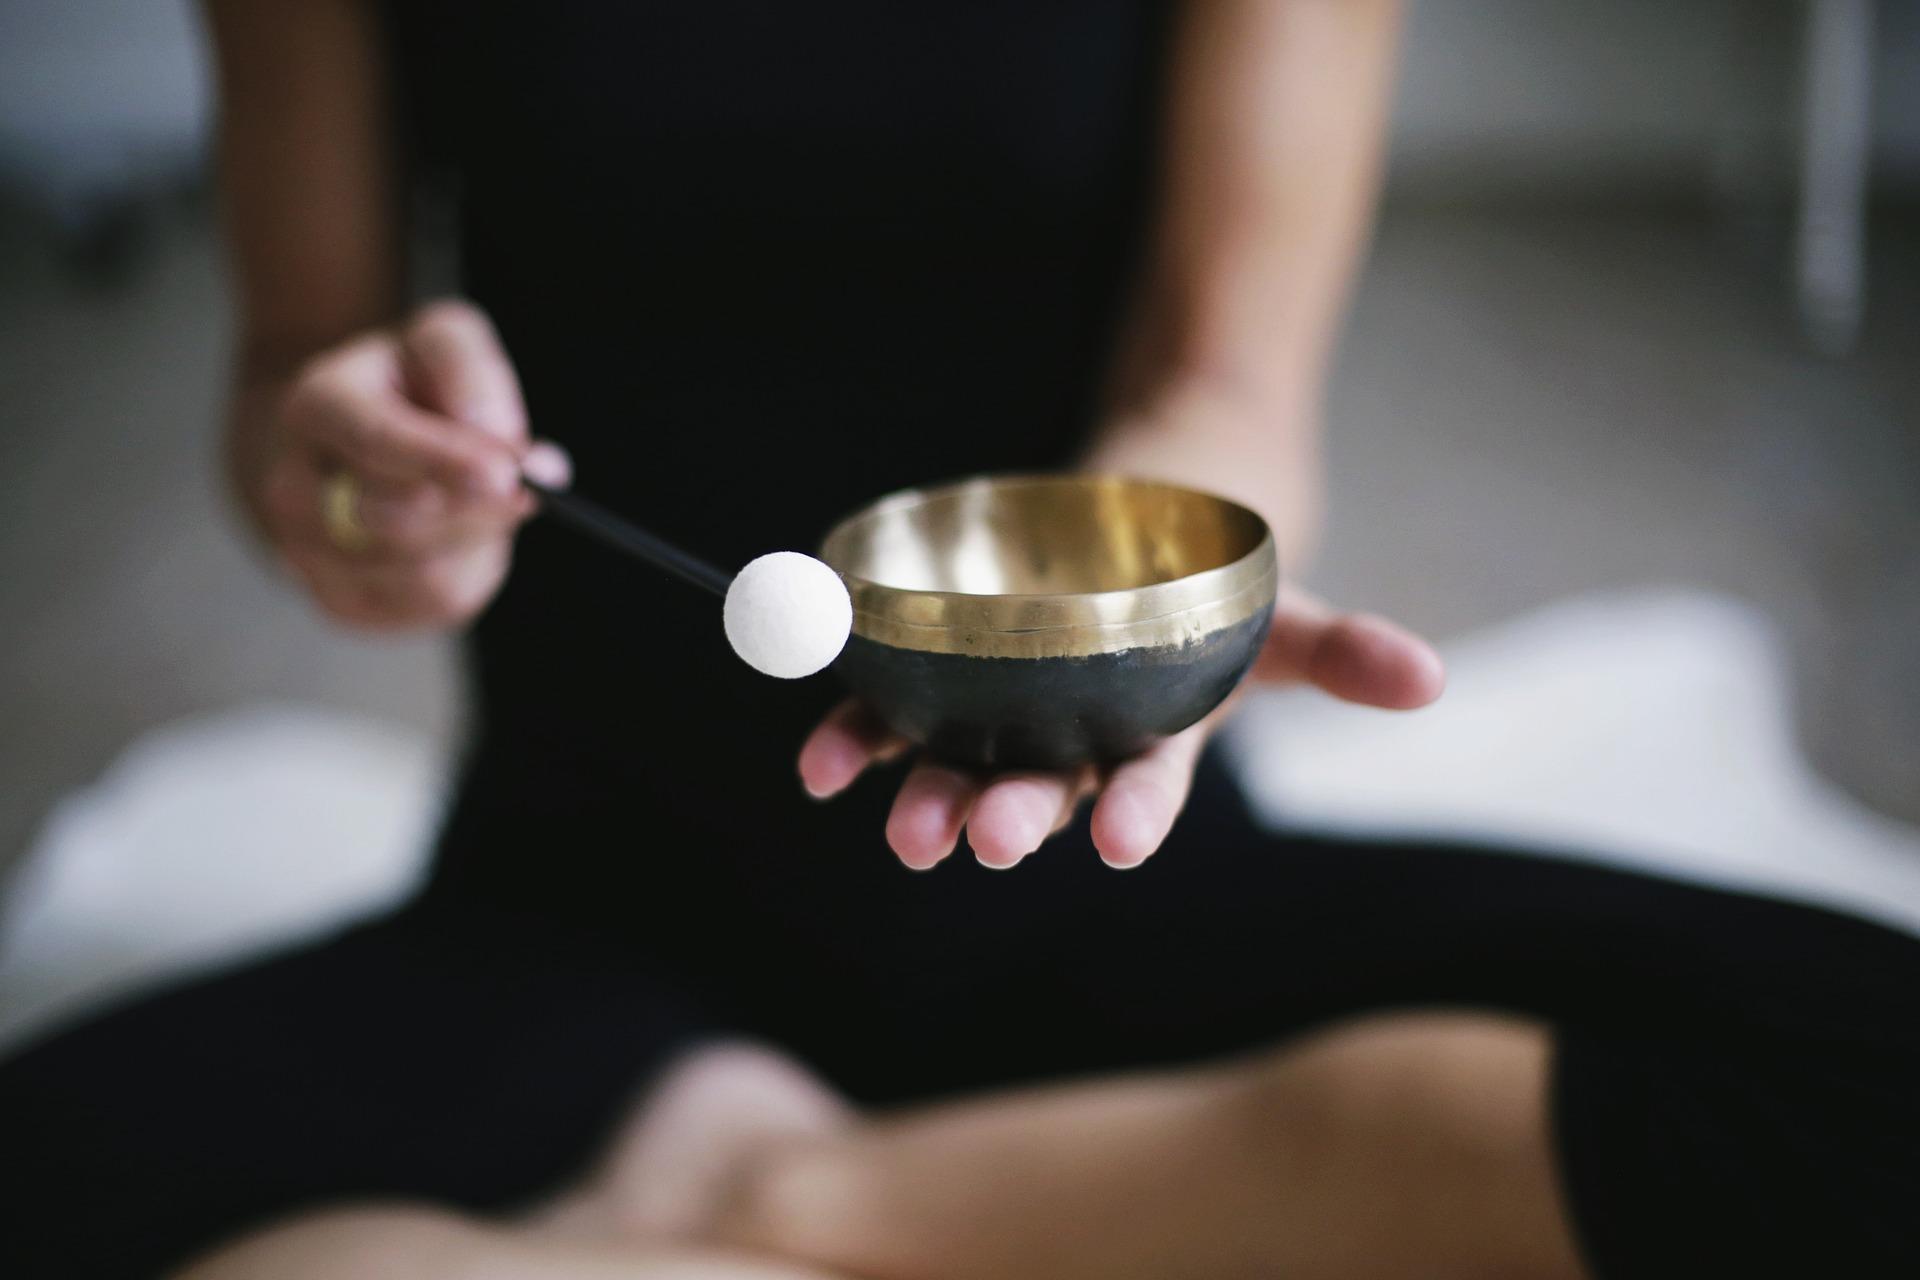 meditation-gong-spa-treatment-sound-healing.jpg